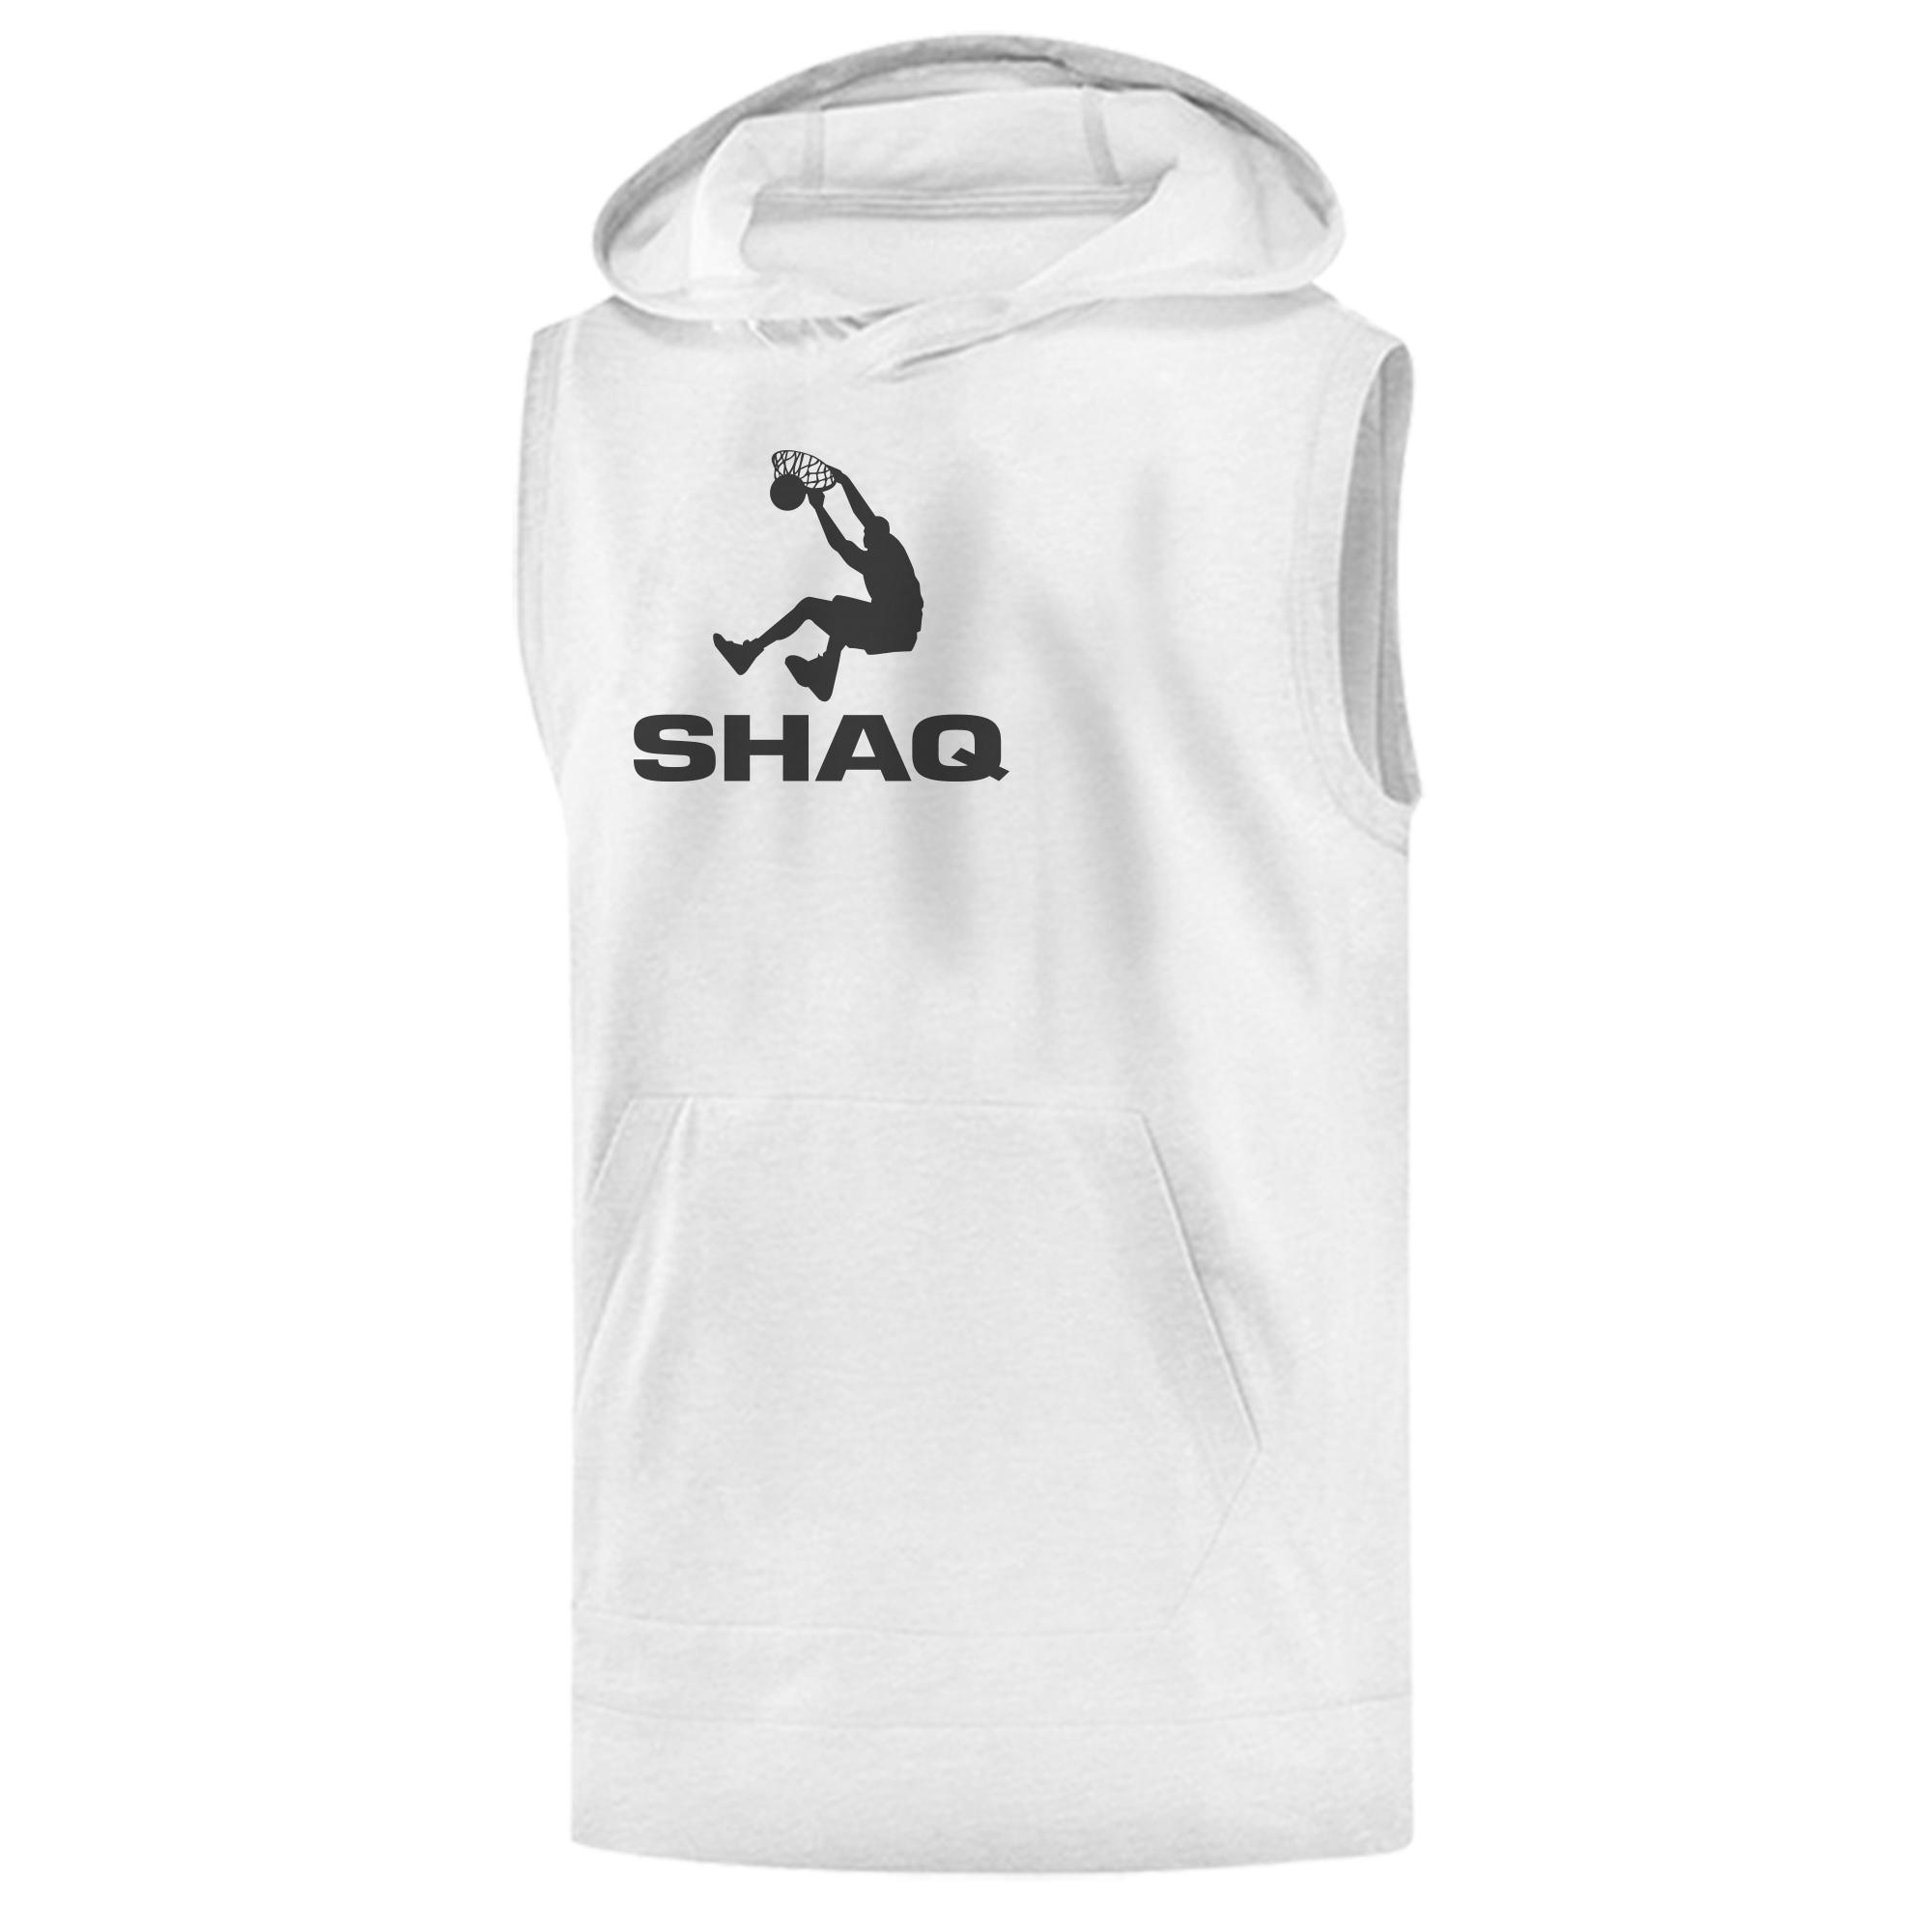 Orlando Magic Shaquille O'Neal Sleeveless (KLS-WHT-392-ShaquilleO'Neal)